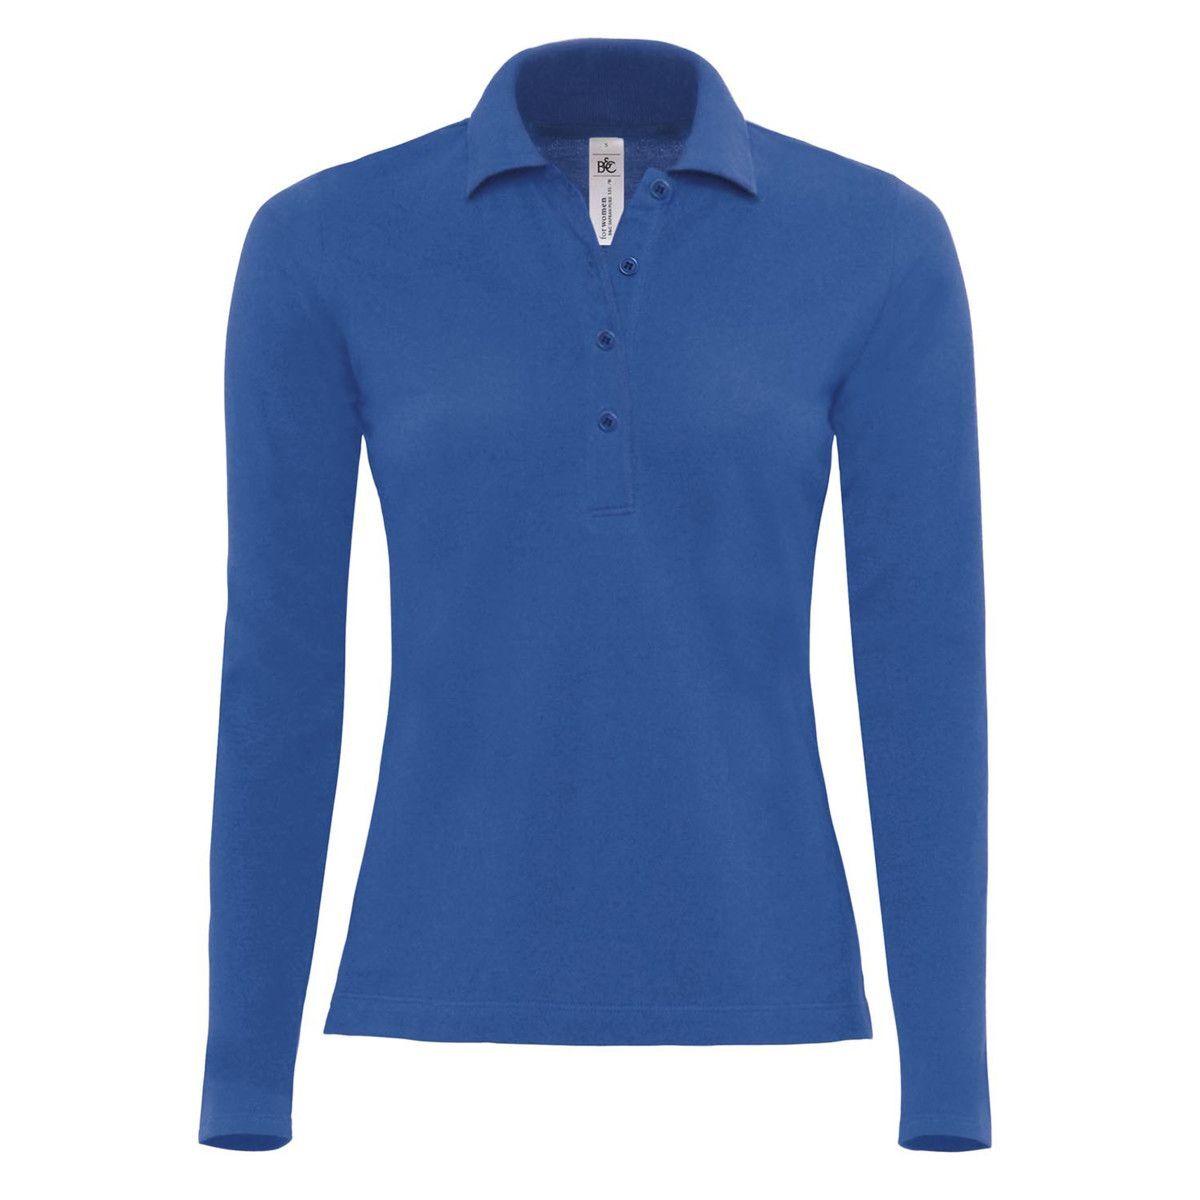 B&C Safran Long Sleeve Piqué Polo Shirts Womens (Royal)